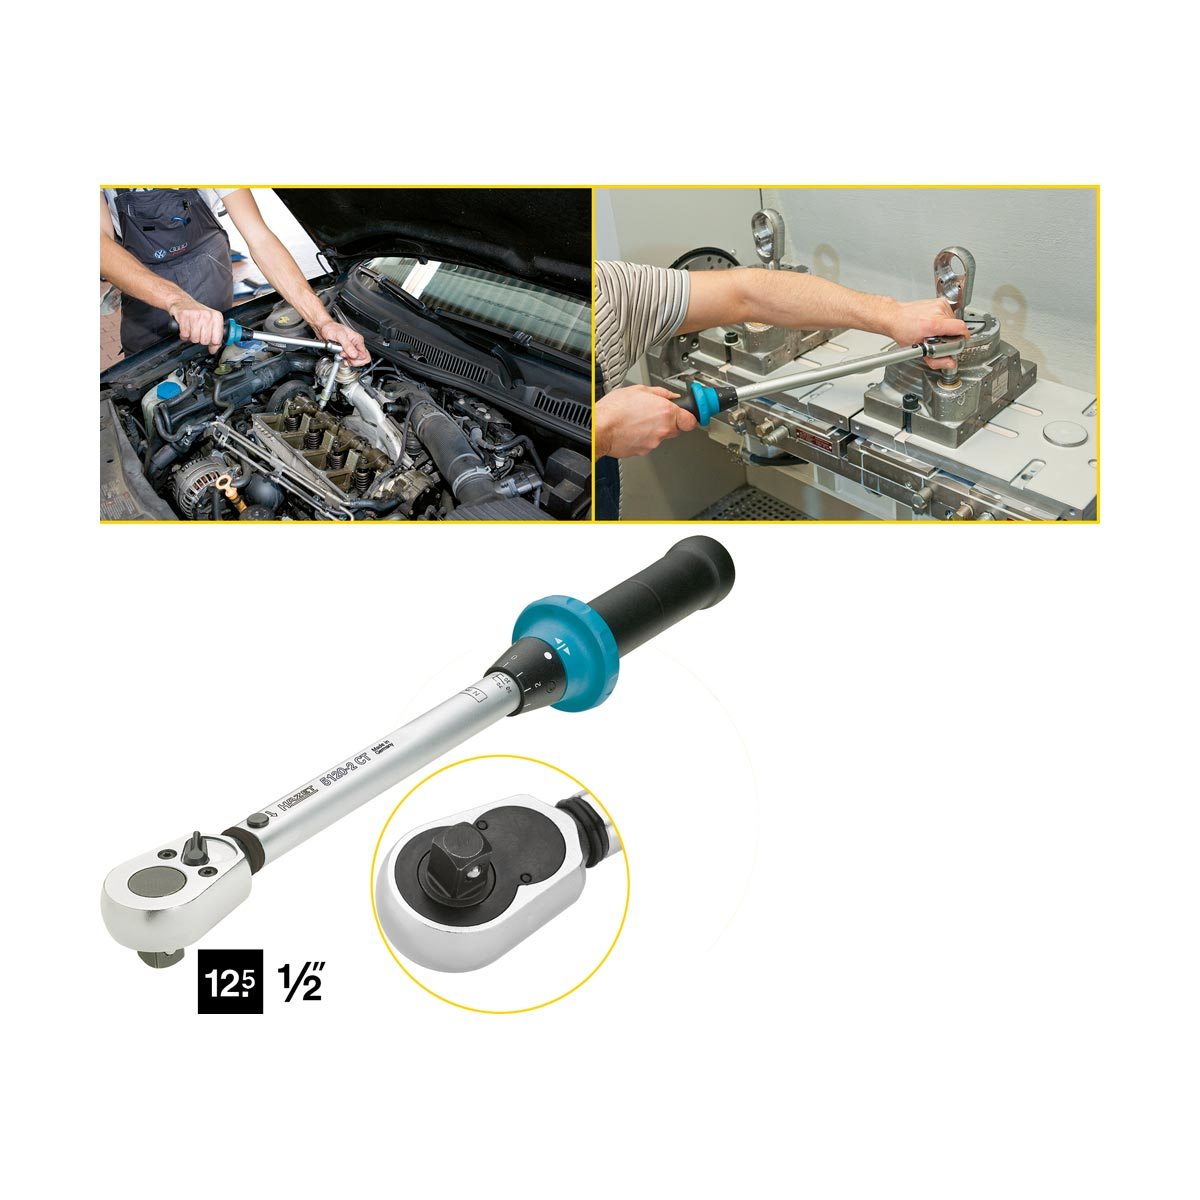 HAZET 5120-2CT Torque wrench with ratchet, 10 - 60 Nm